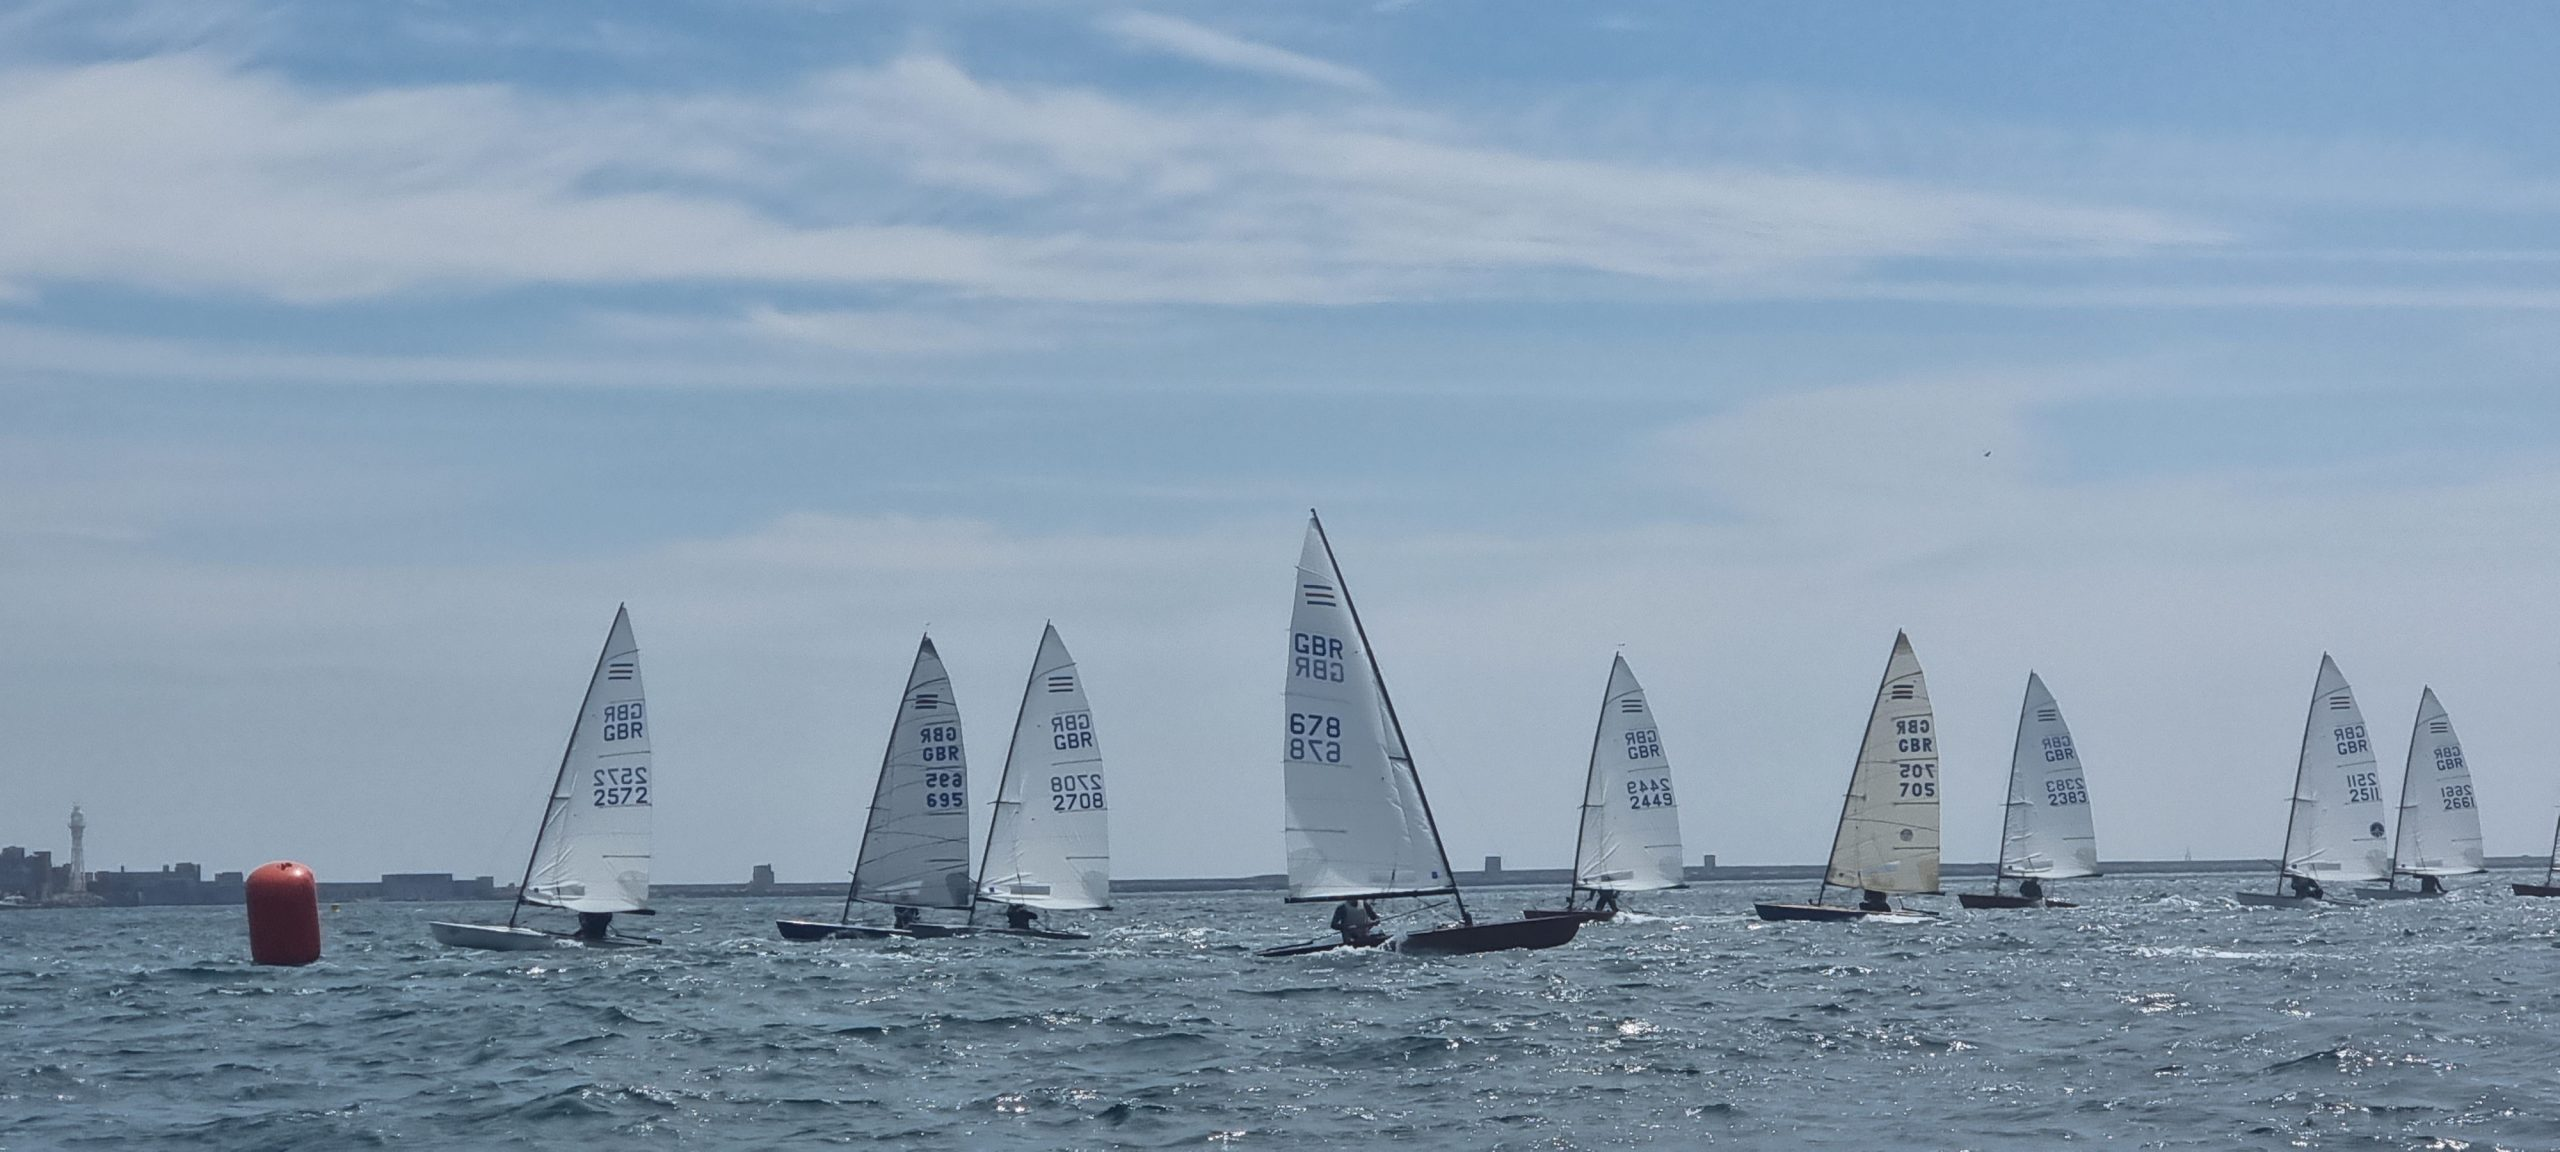 Allen sponsored Contender open at Castle Cove Sailing Club